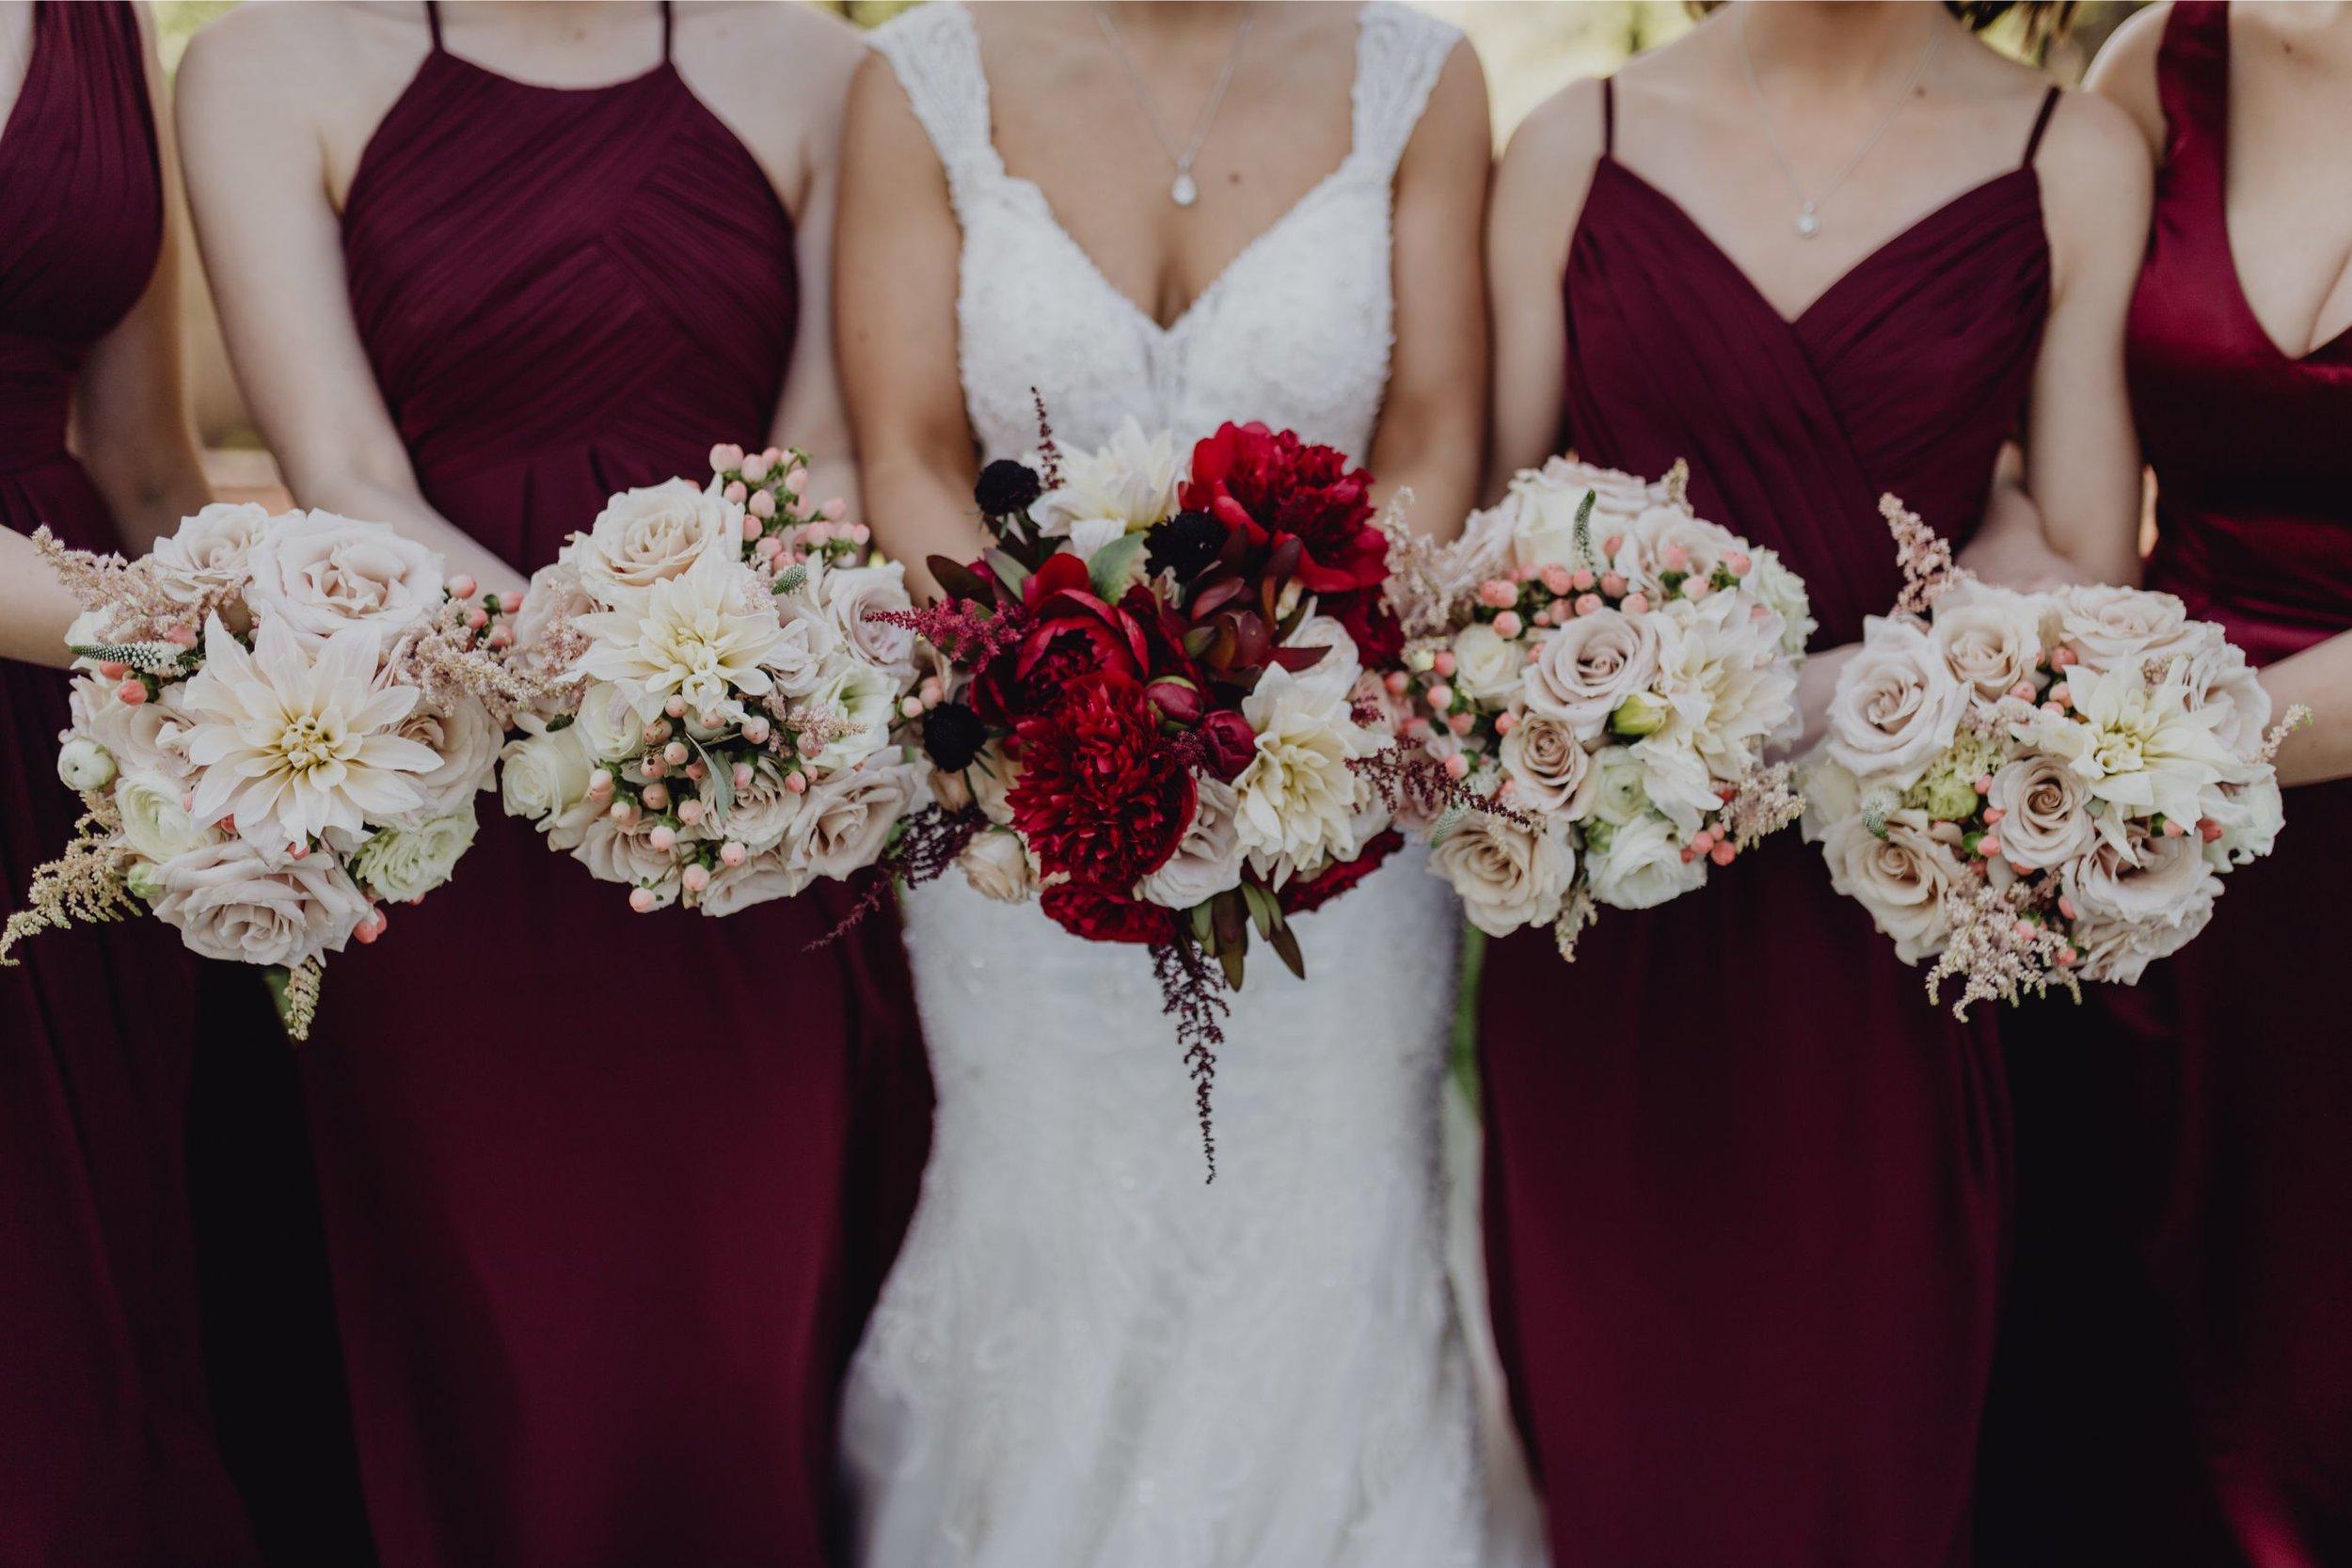 North-Dallas-Wedding-Florist-David-Co.-7.jpg